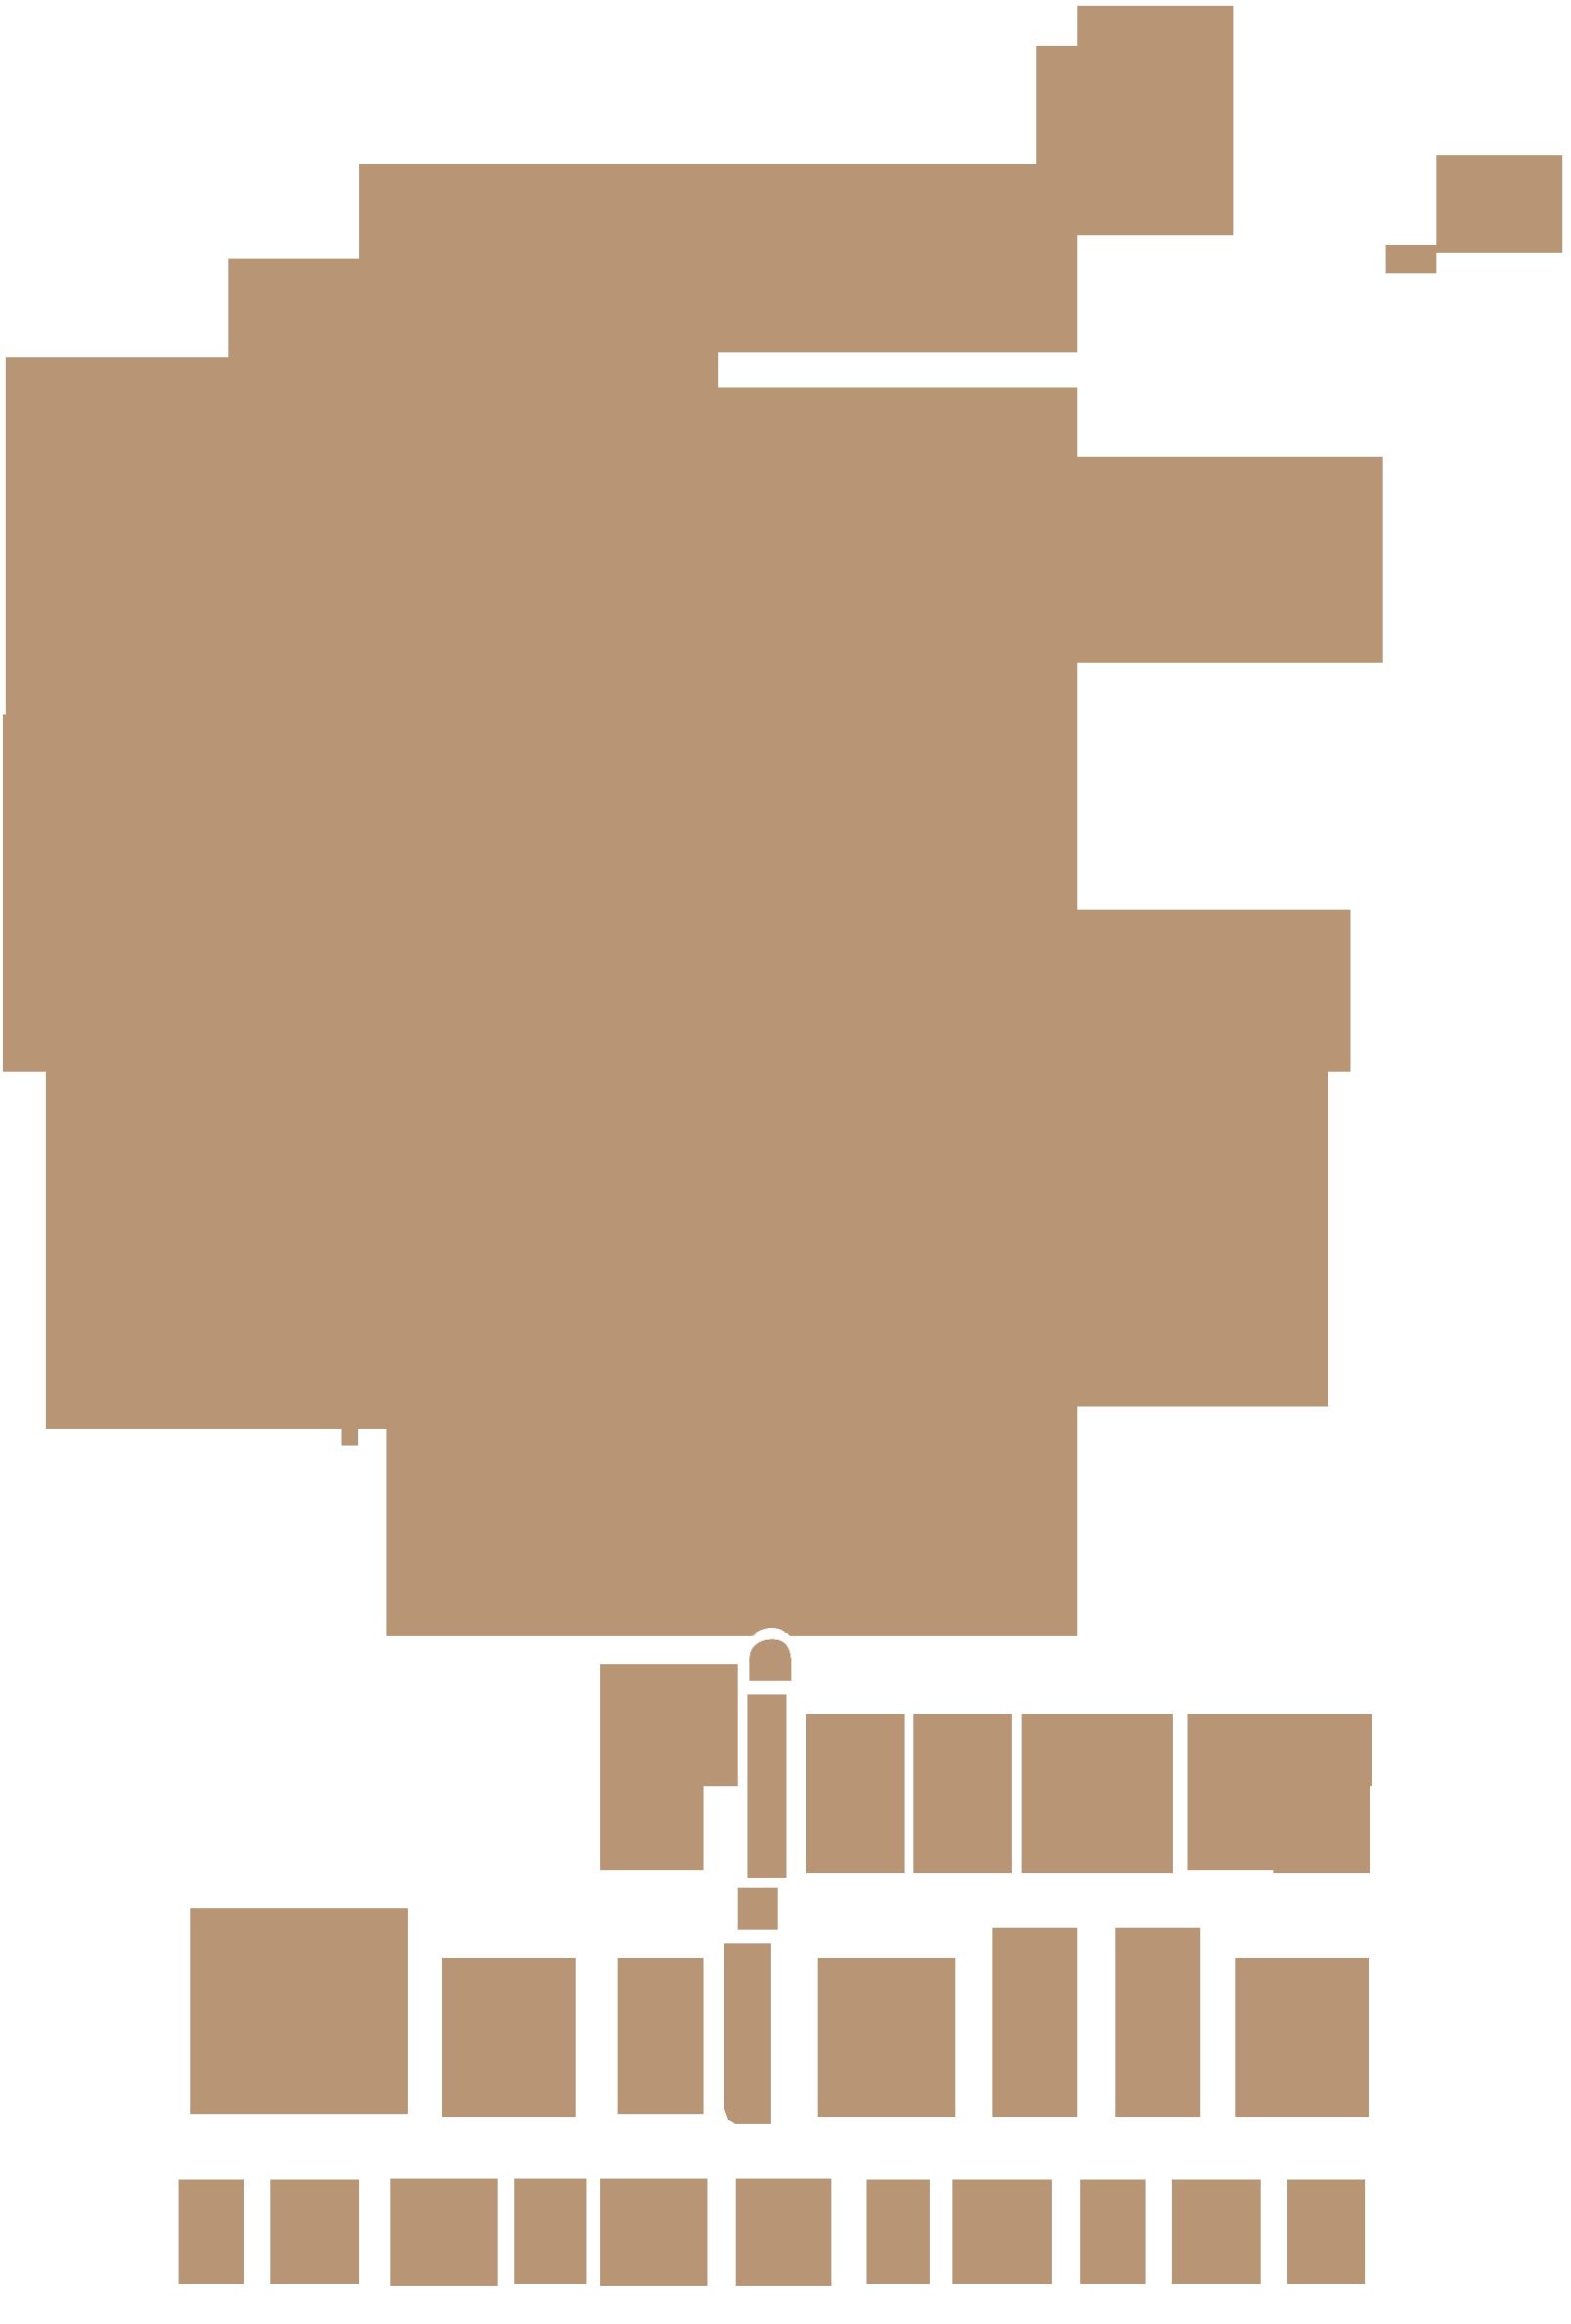 Pissors Marietta Photography logo